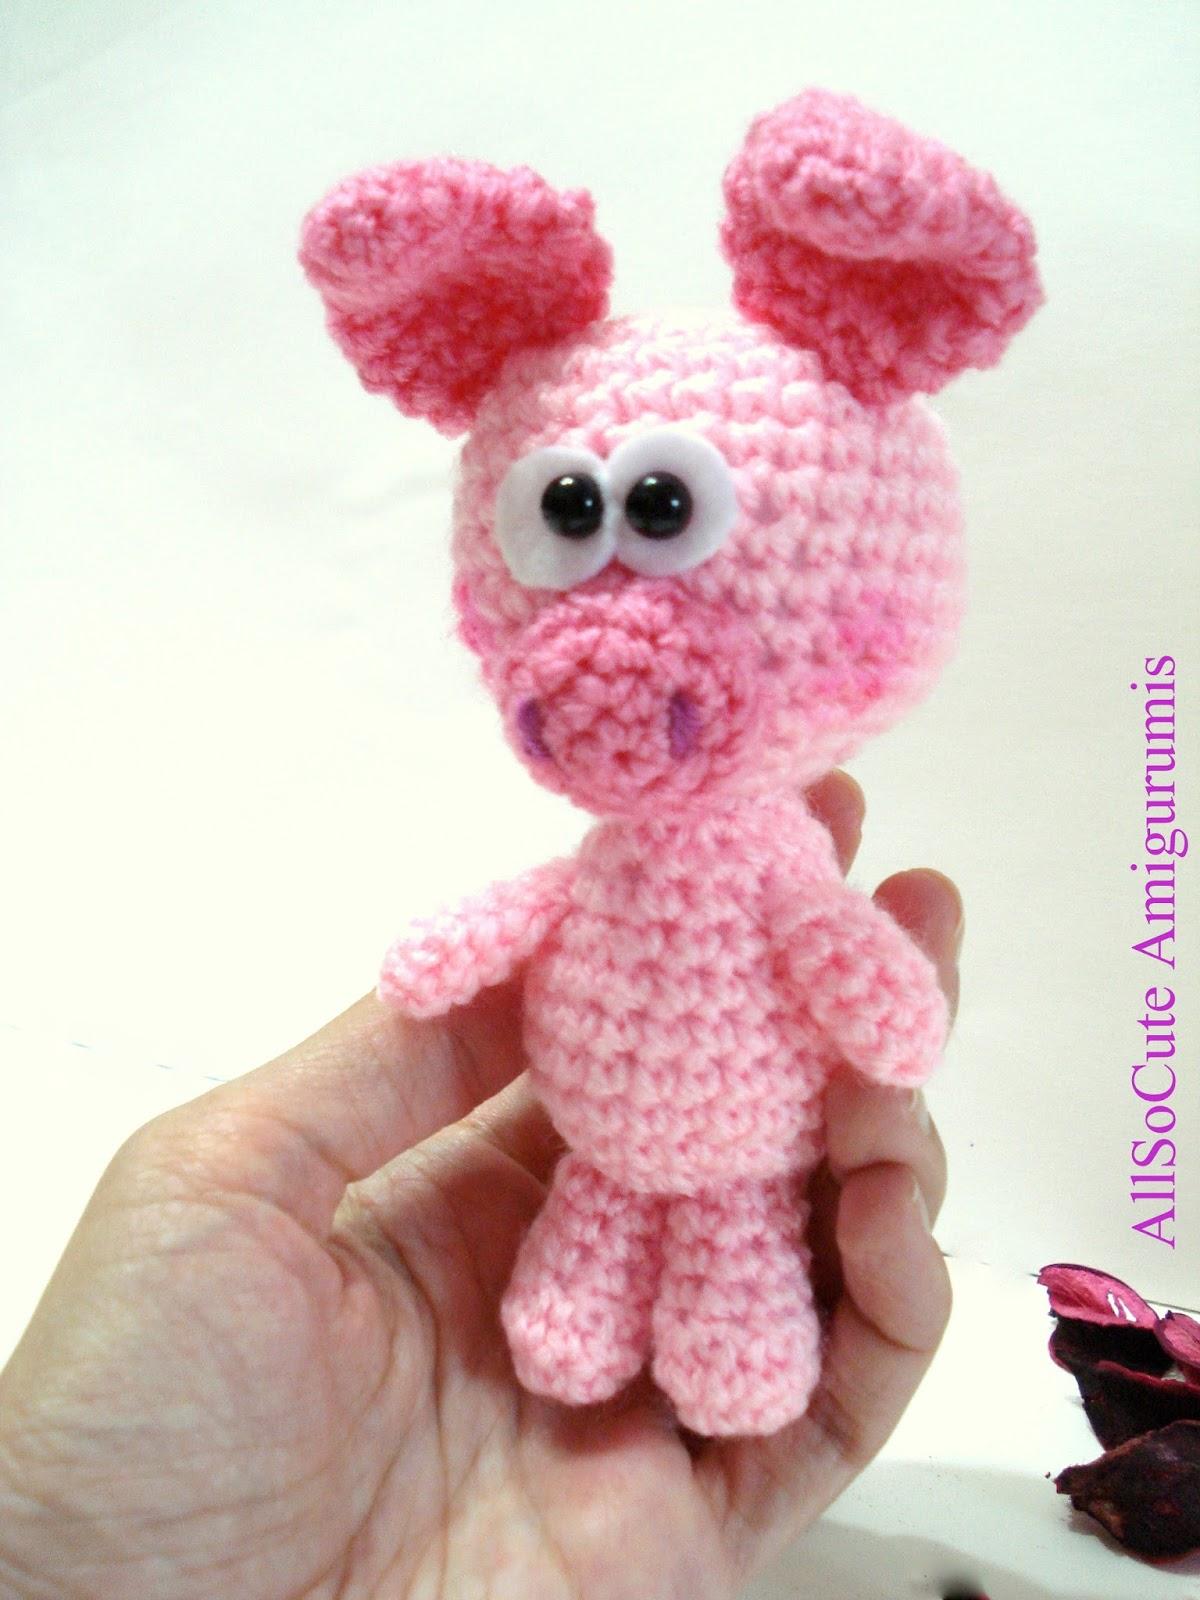 Amigurumi Pig : AllSoCute Amigurumis: Crochet Pig, Amigurumi Pig, Baby Pig ...